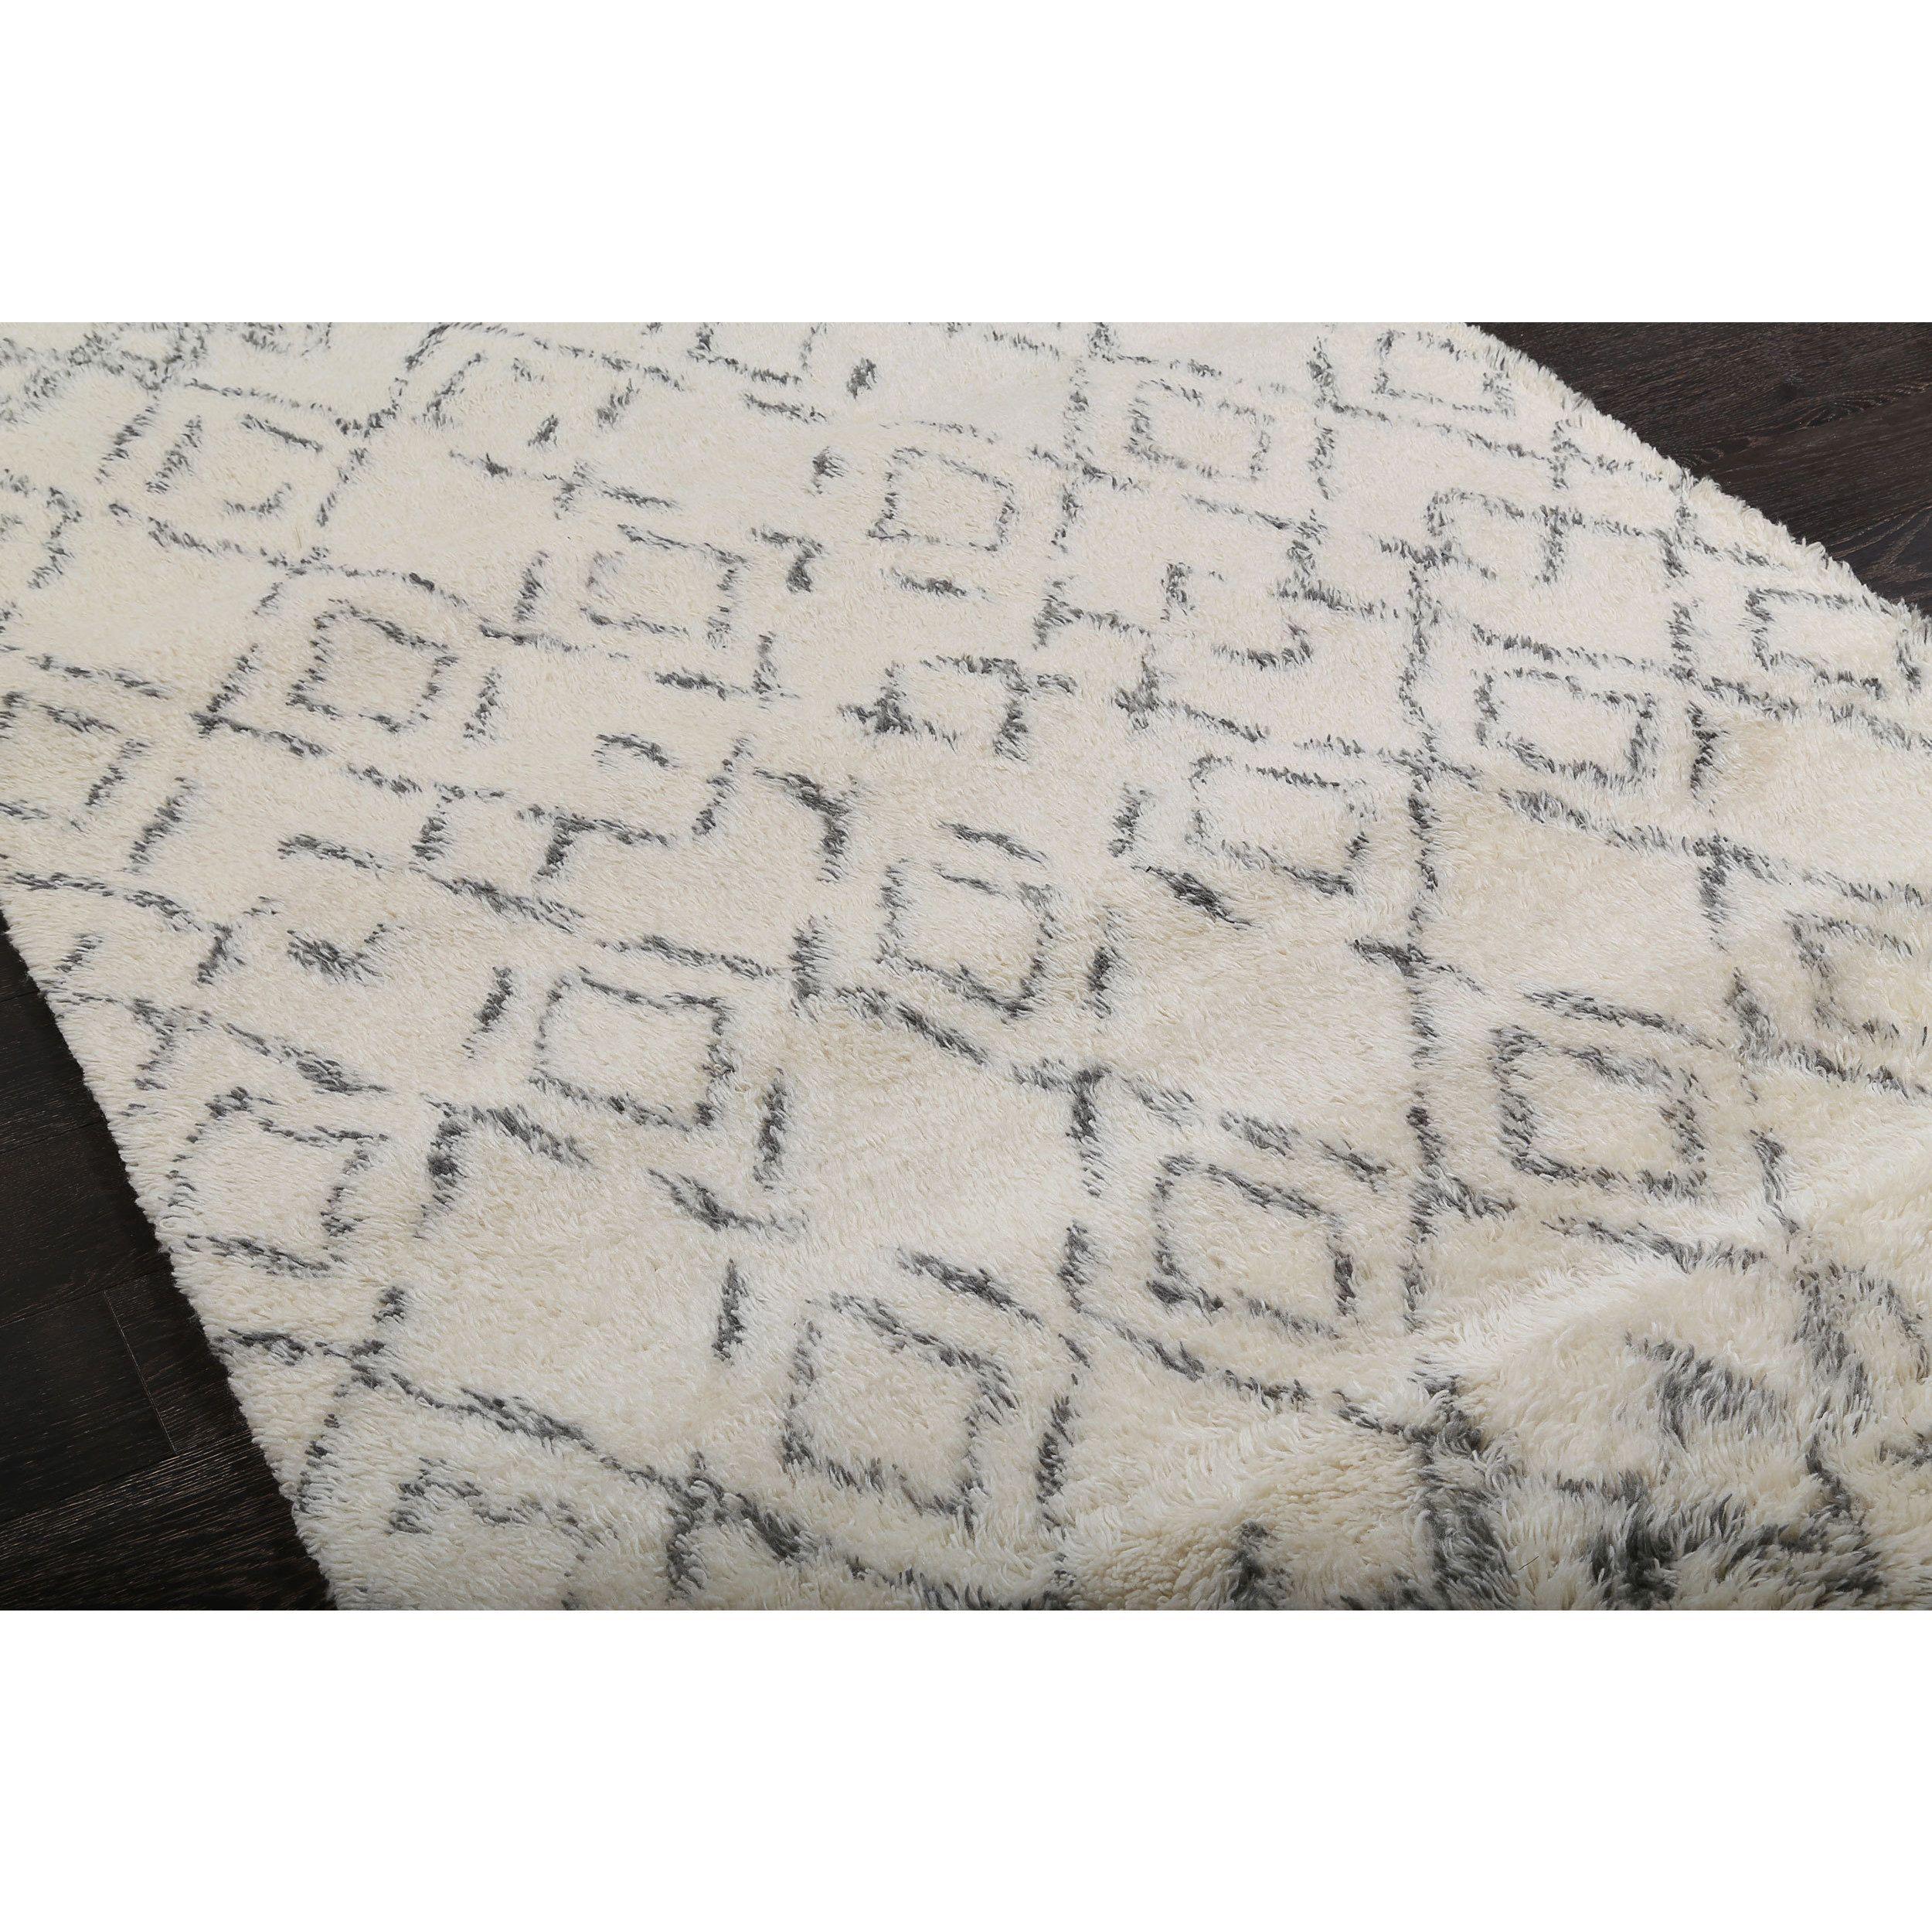 Beni Ourain Moroccan Beige Wool Area Rug 9 X 12 Overstock